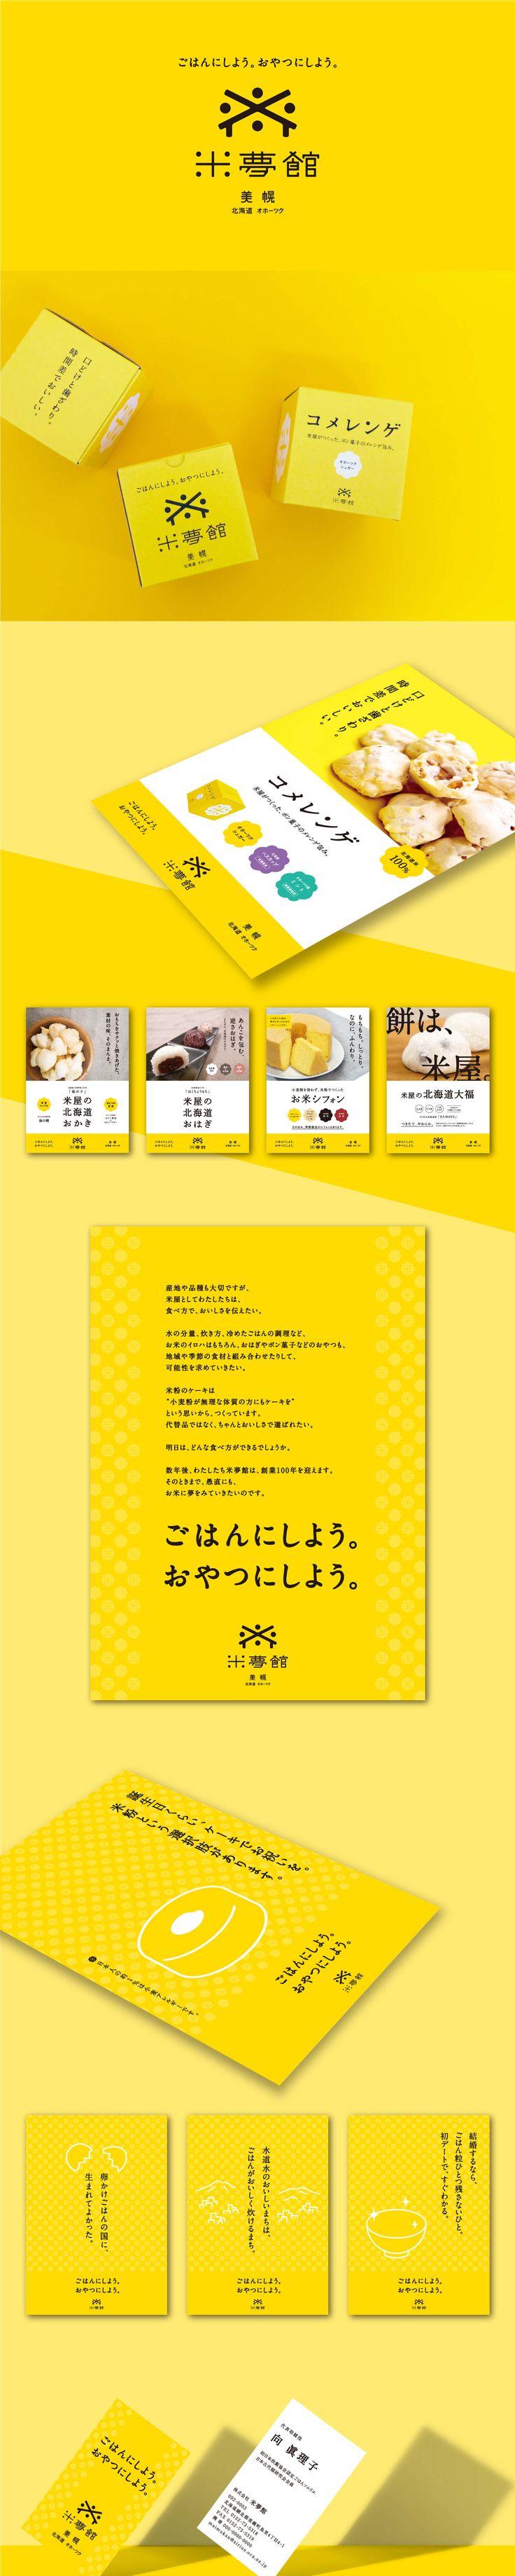 米夢館 - IMPROVIDE Co.,Ltd.